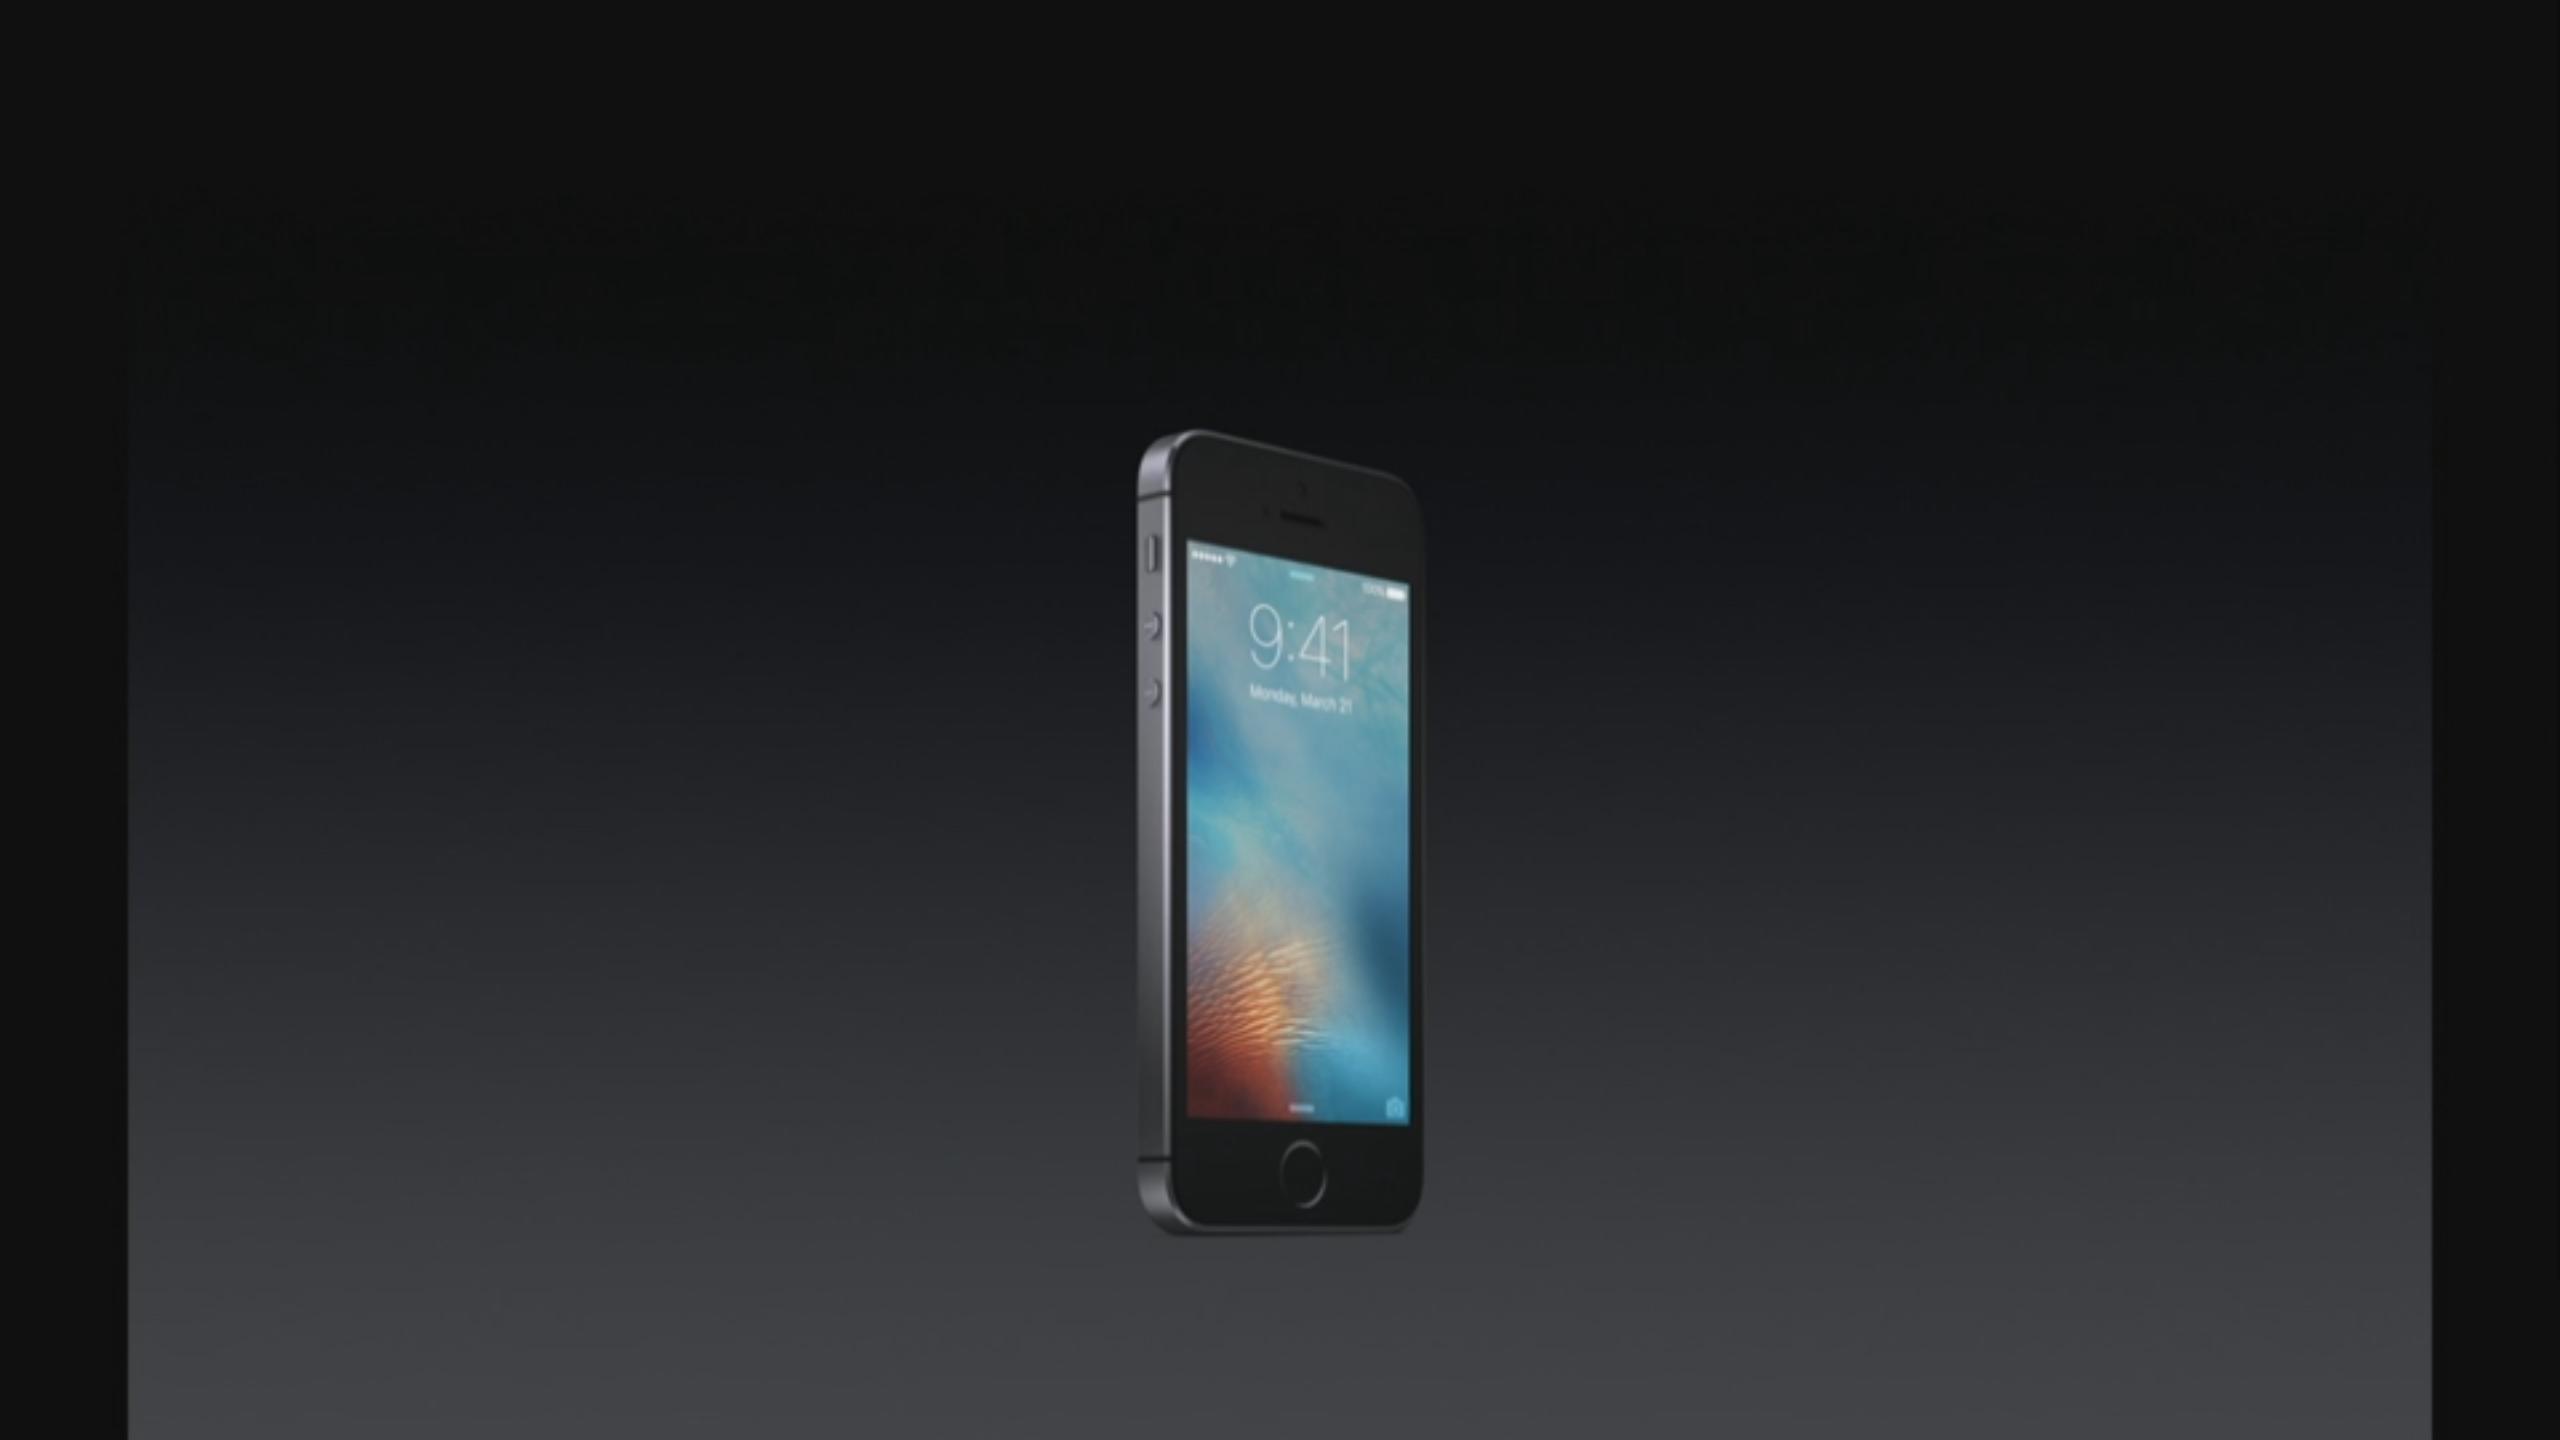 Apple announces iPhone SE, 4